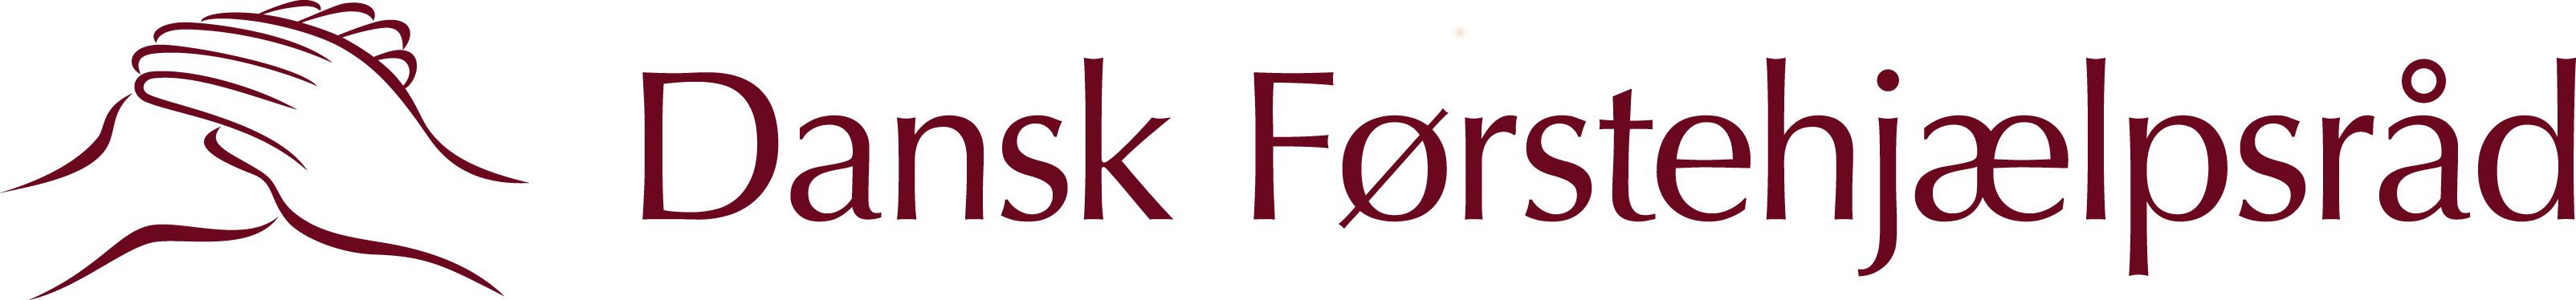 DFR_logo_0X85_lang